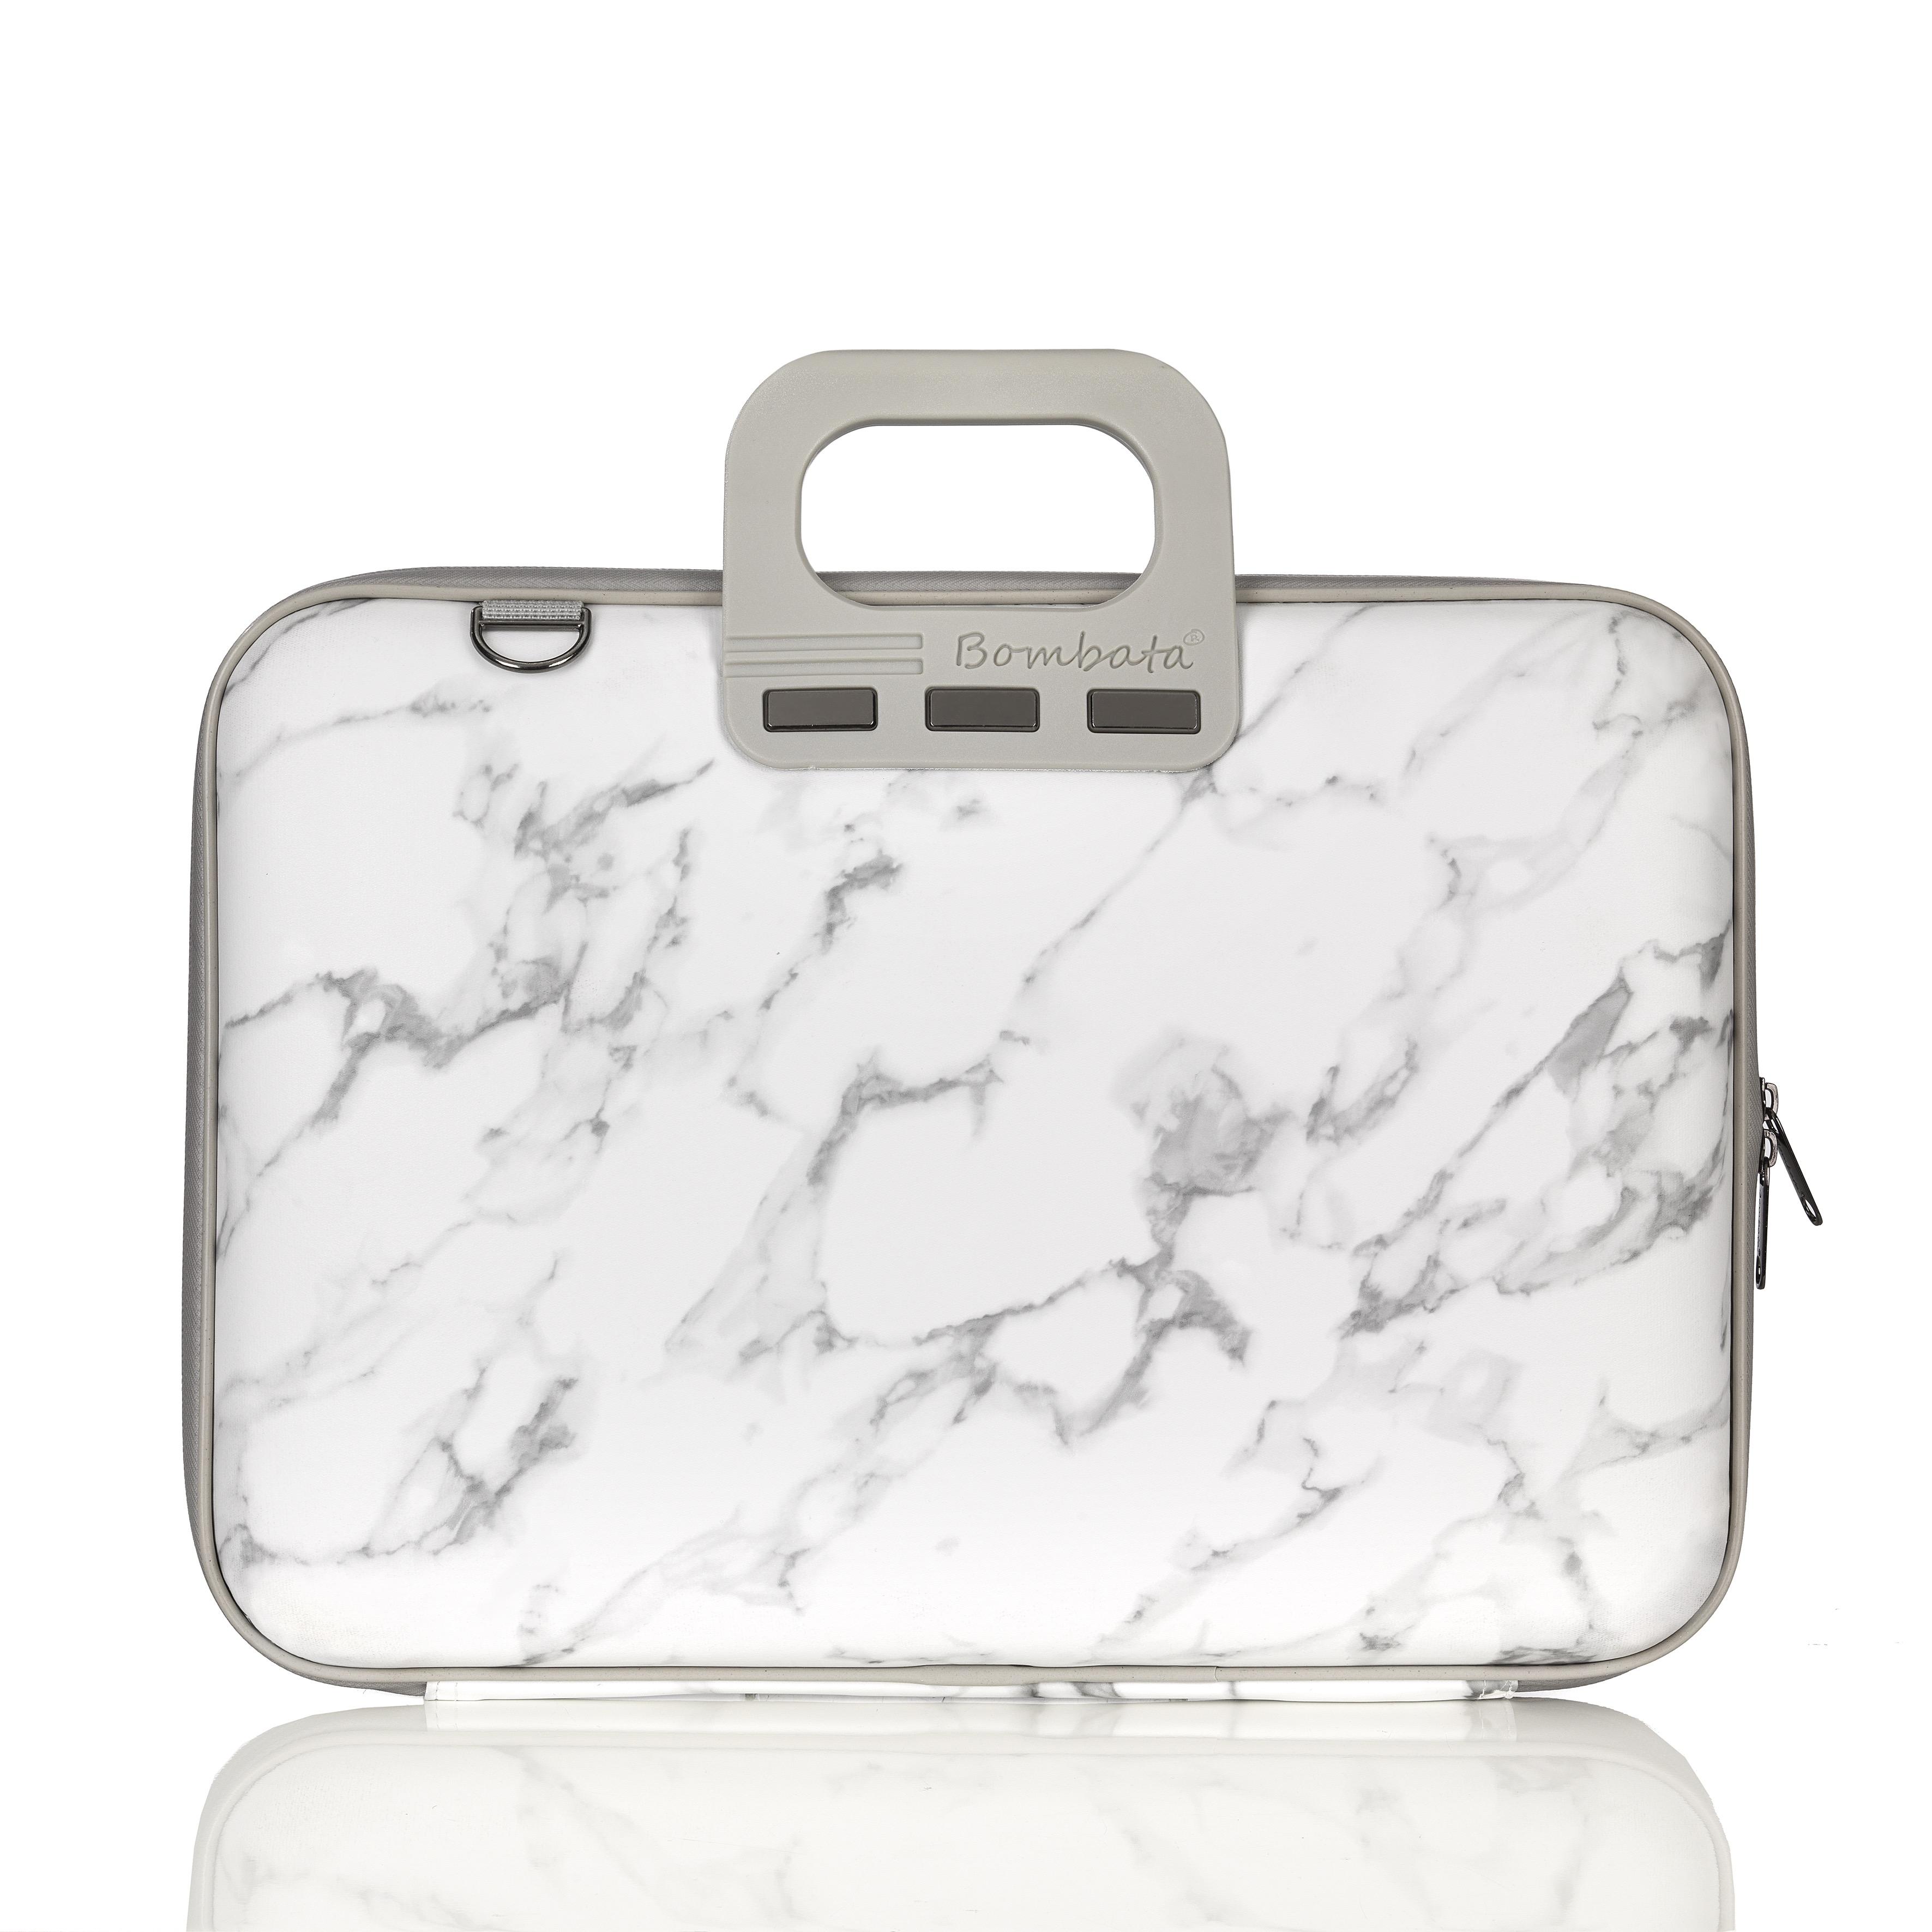 Bombata laptop bag in Carrara marble print - designed in Italy